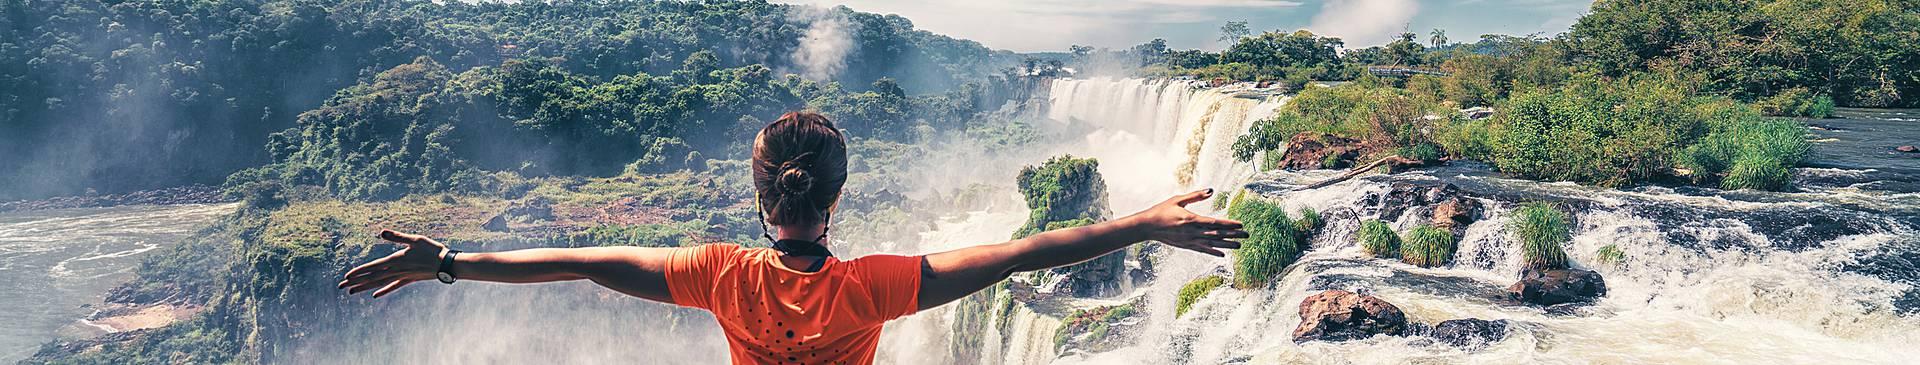 Brazil adventure